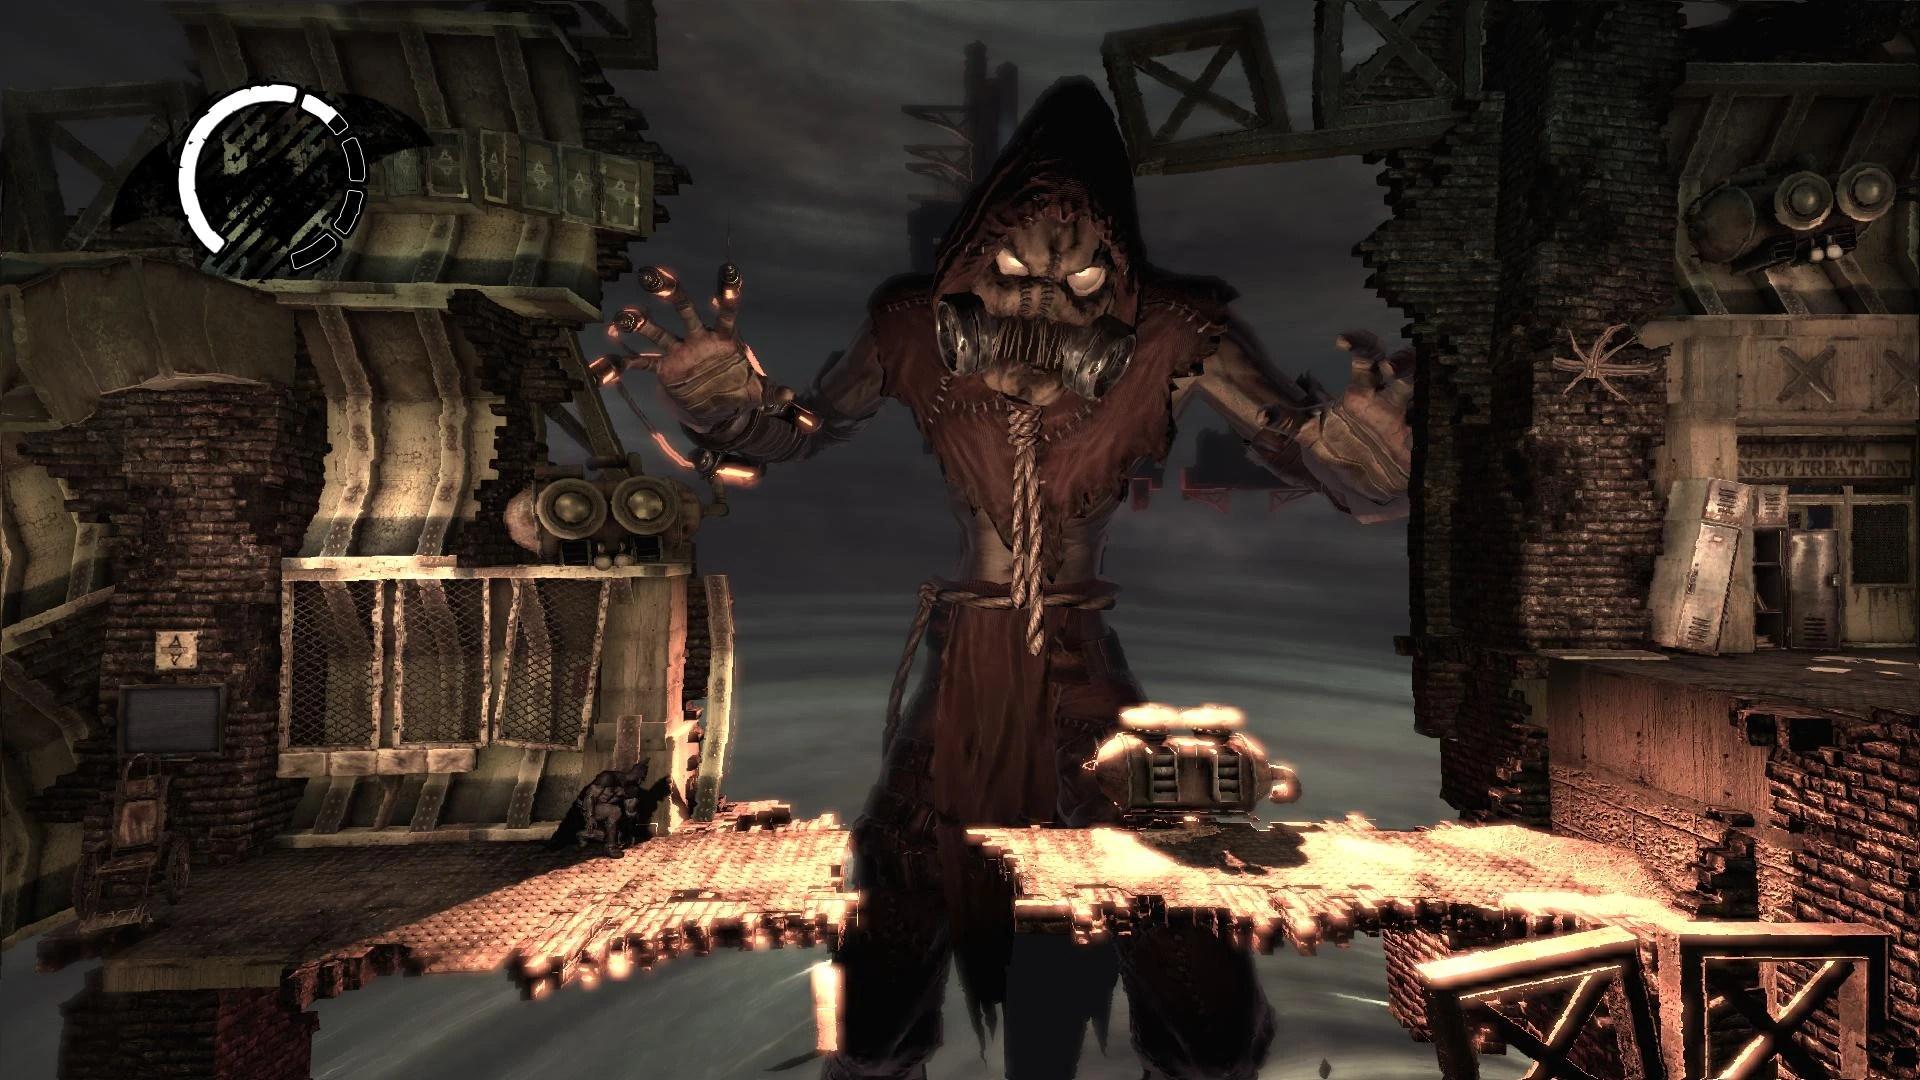 https://i2.wp.com/images.wikia.com/batman/images/f/f4/Batman-arkham-asylum-scarecrow.jpg